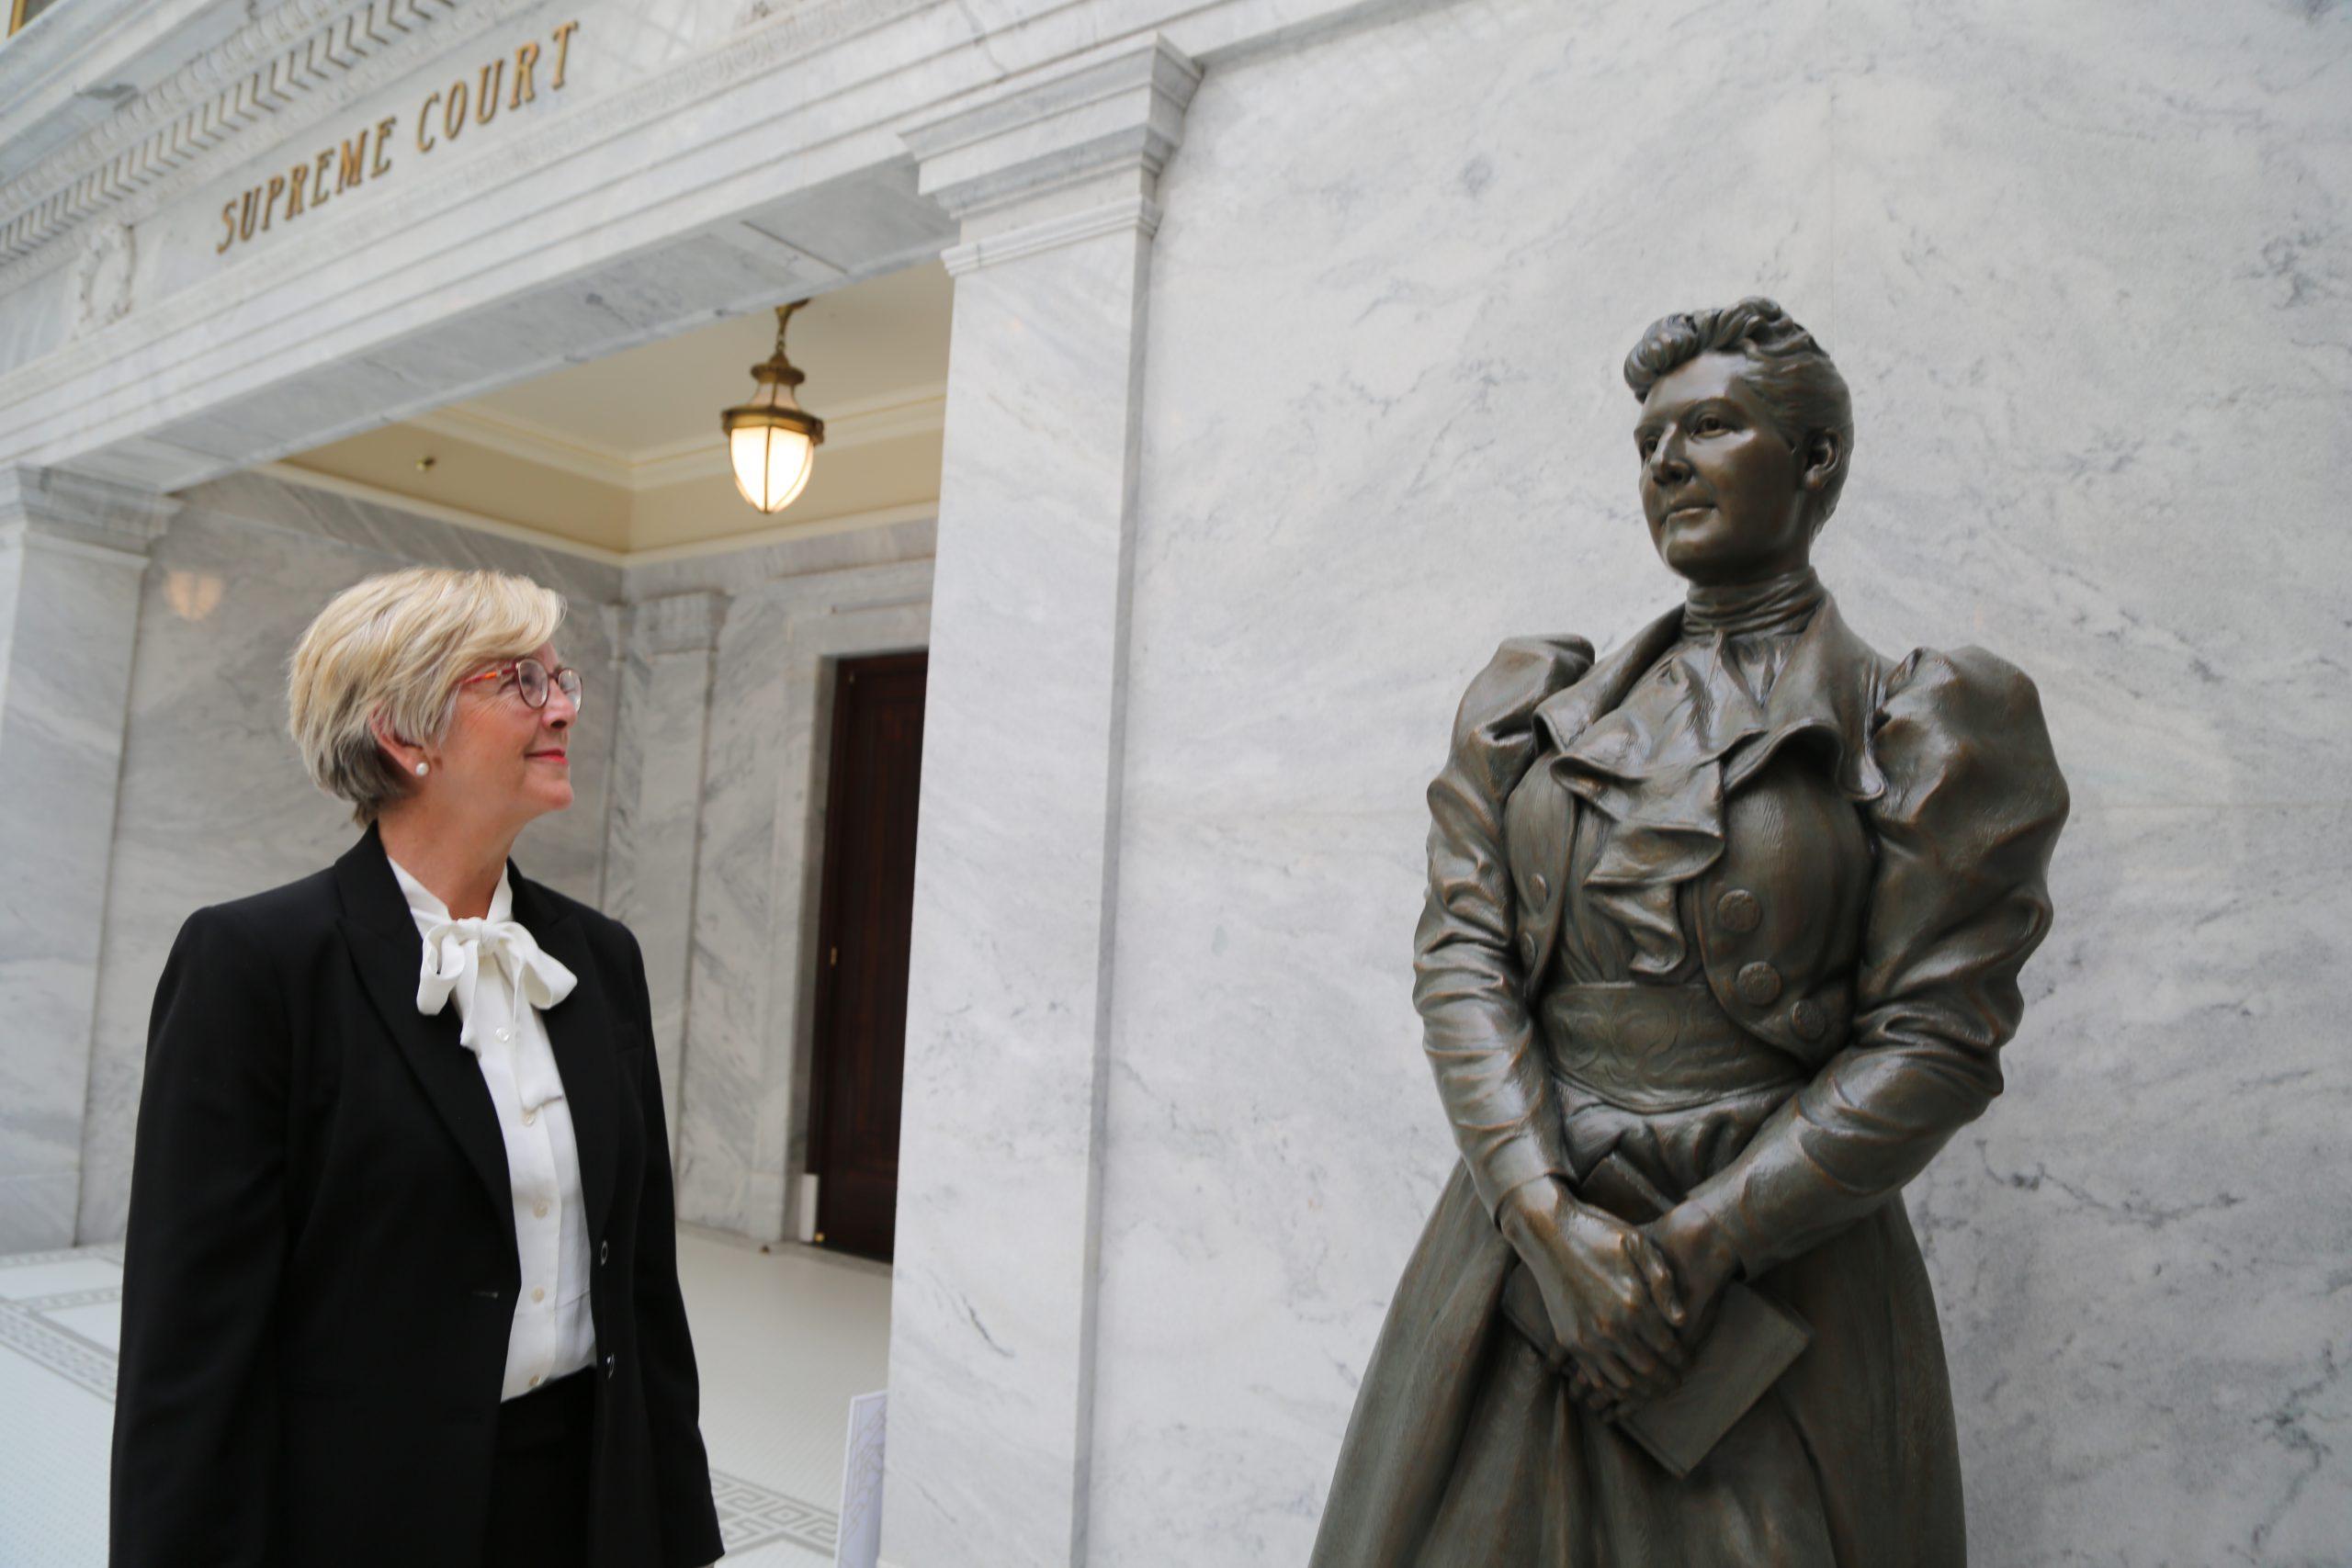 https://beckyforutah.com/wp-content/uploads/2021/07/Becky-Edwards-for-US-Senate-Launch-093-scaled.jpg